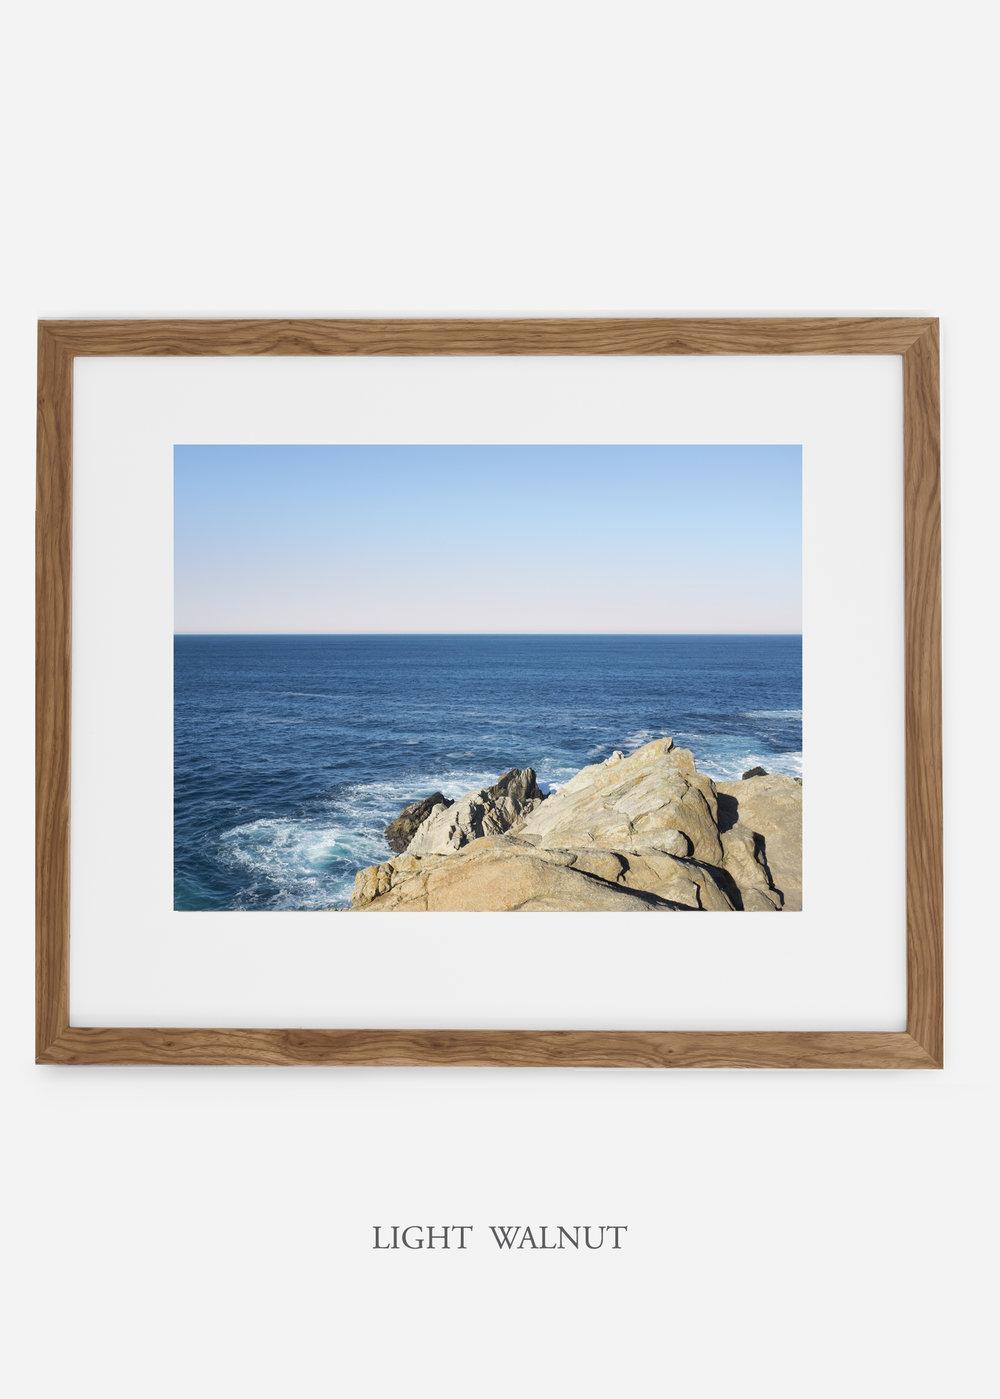 WilderCalifornia_lightwalnutframe_interiordesign_oceanprint_PacificOceanNo.2.jpg